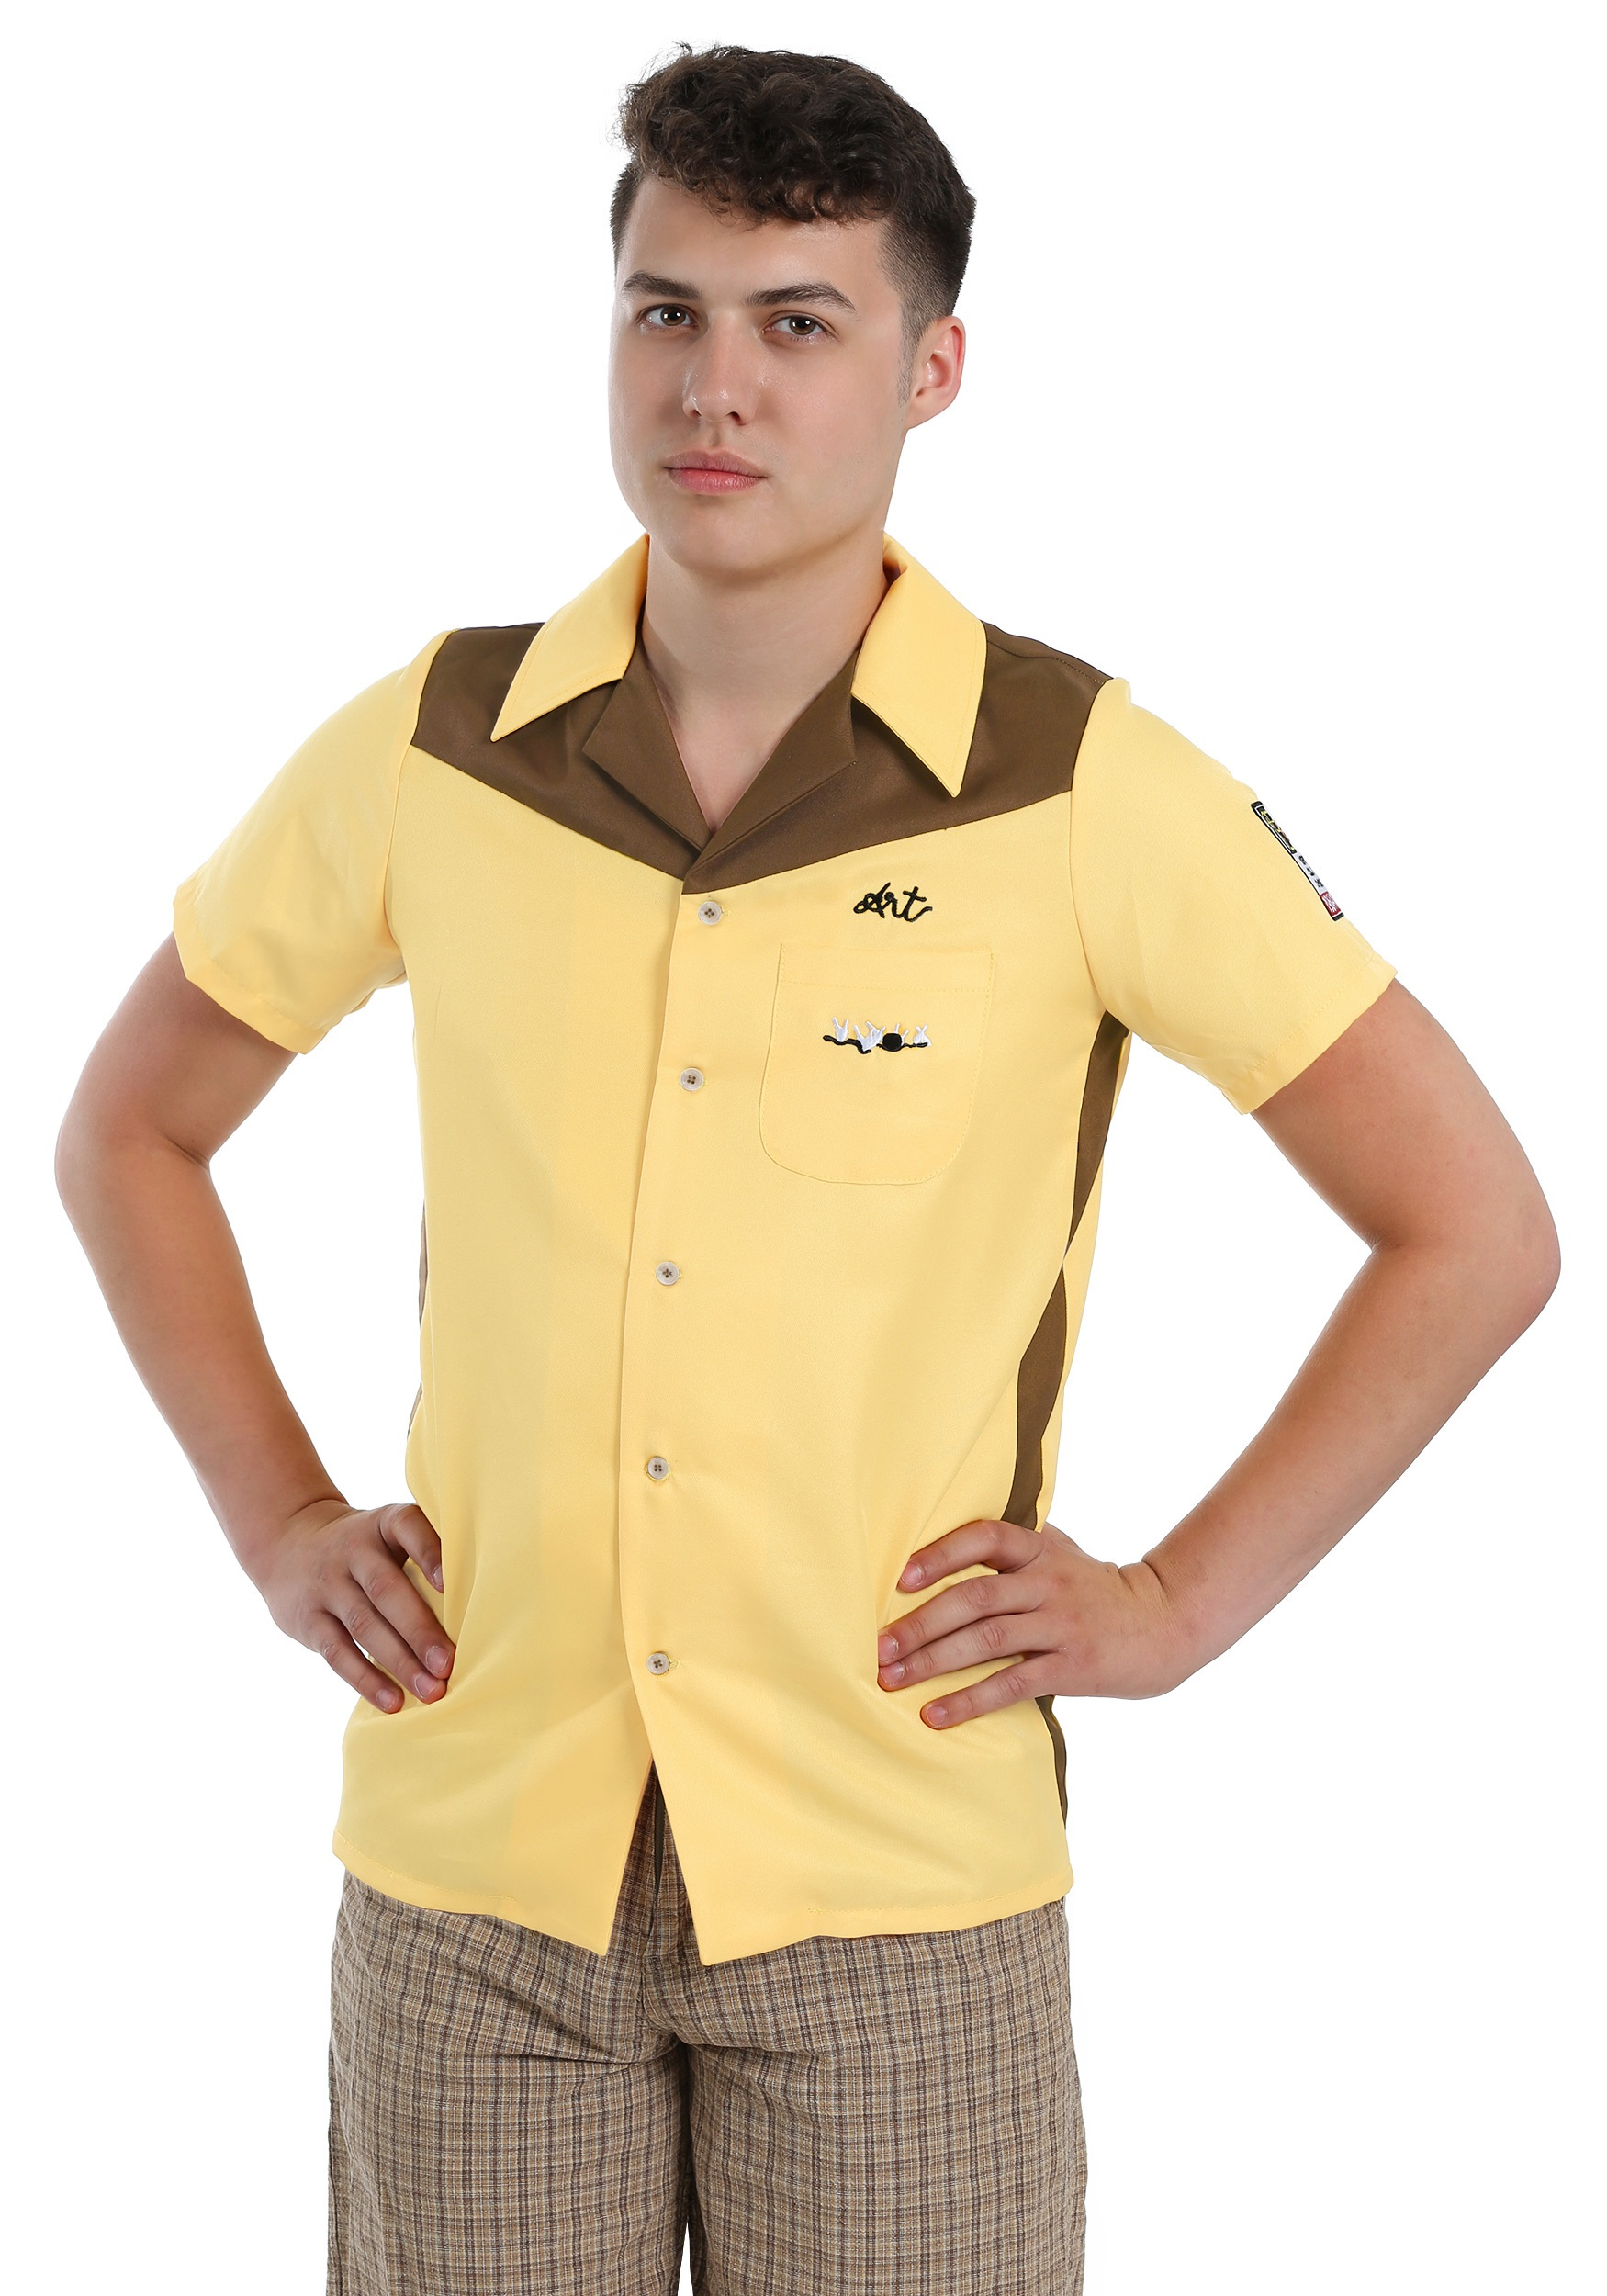 The Big Lebowski Medina Sod Bowling Shirt for Men